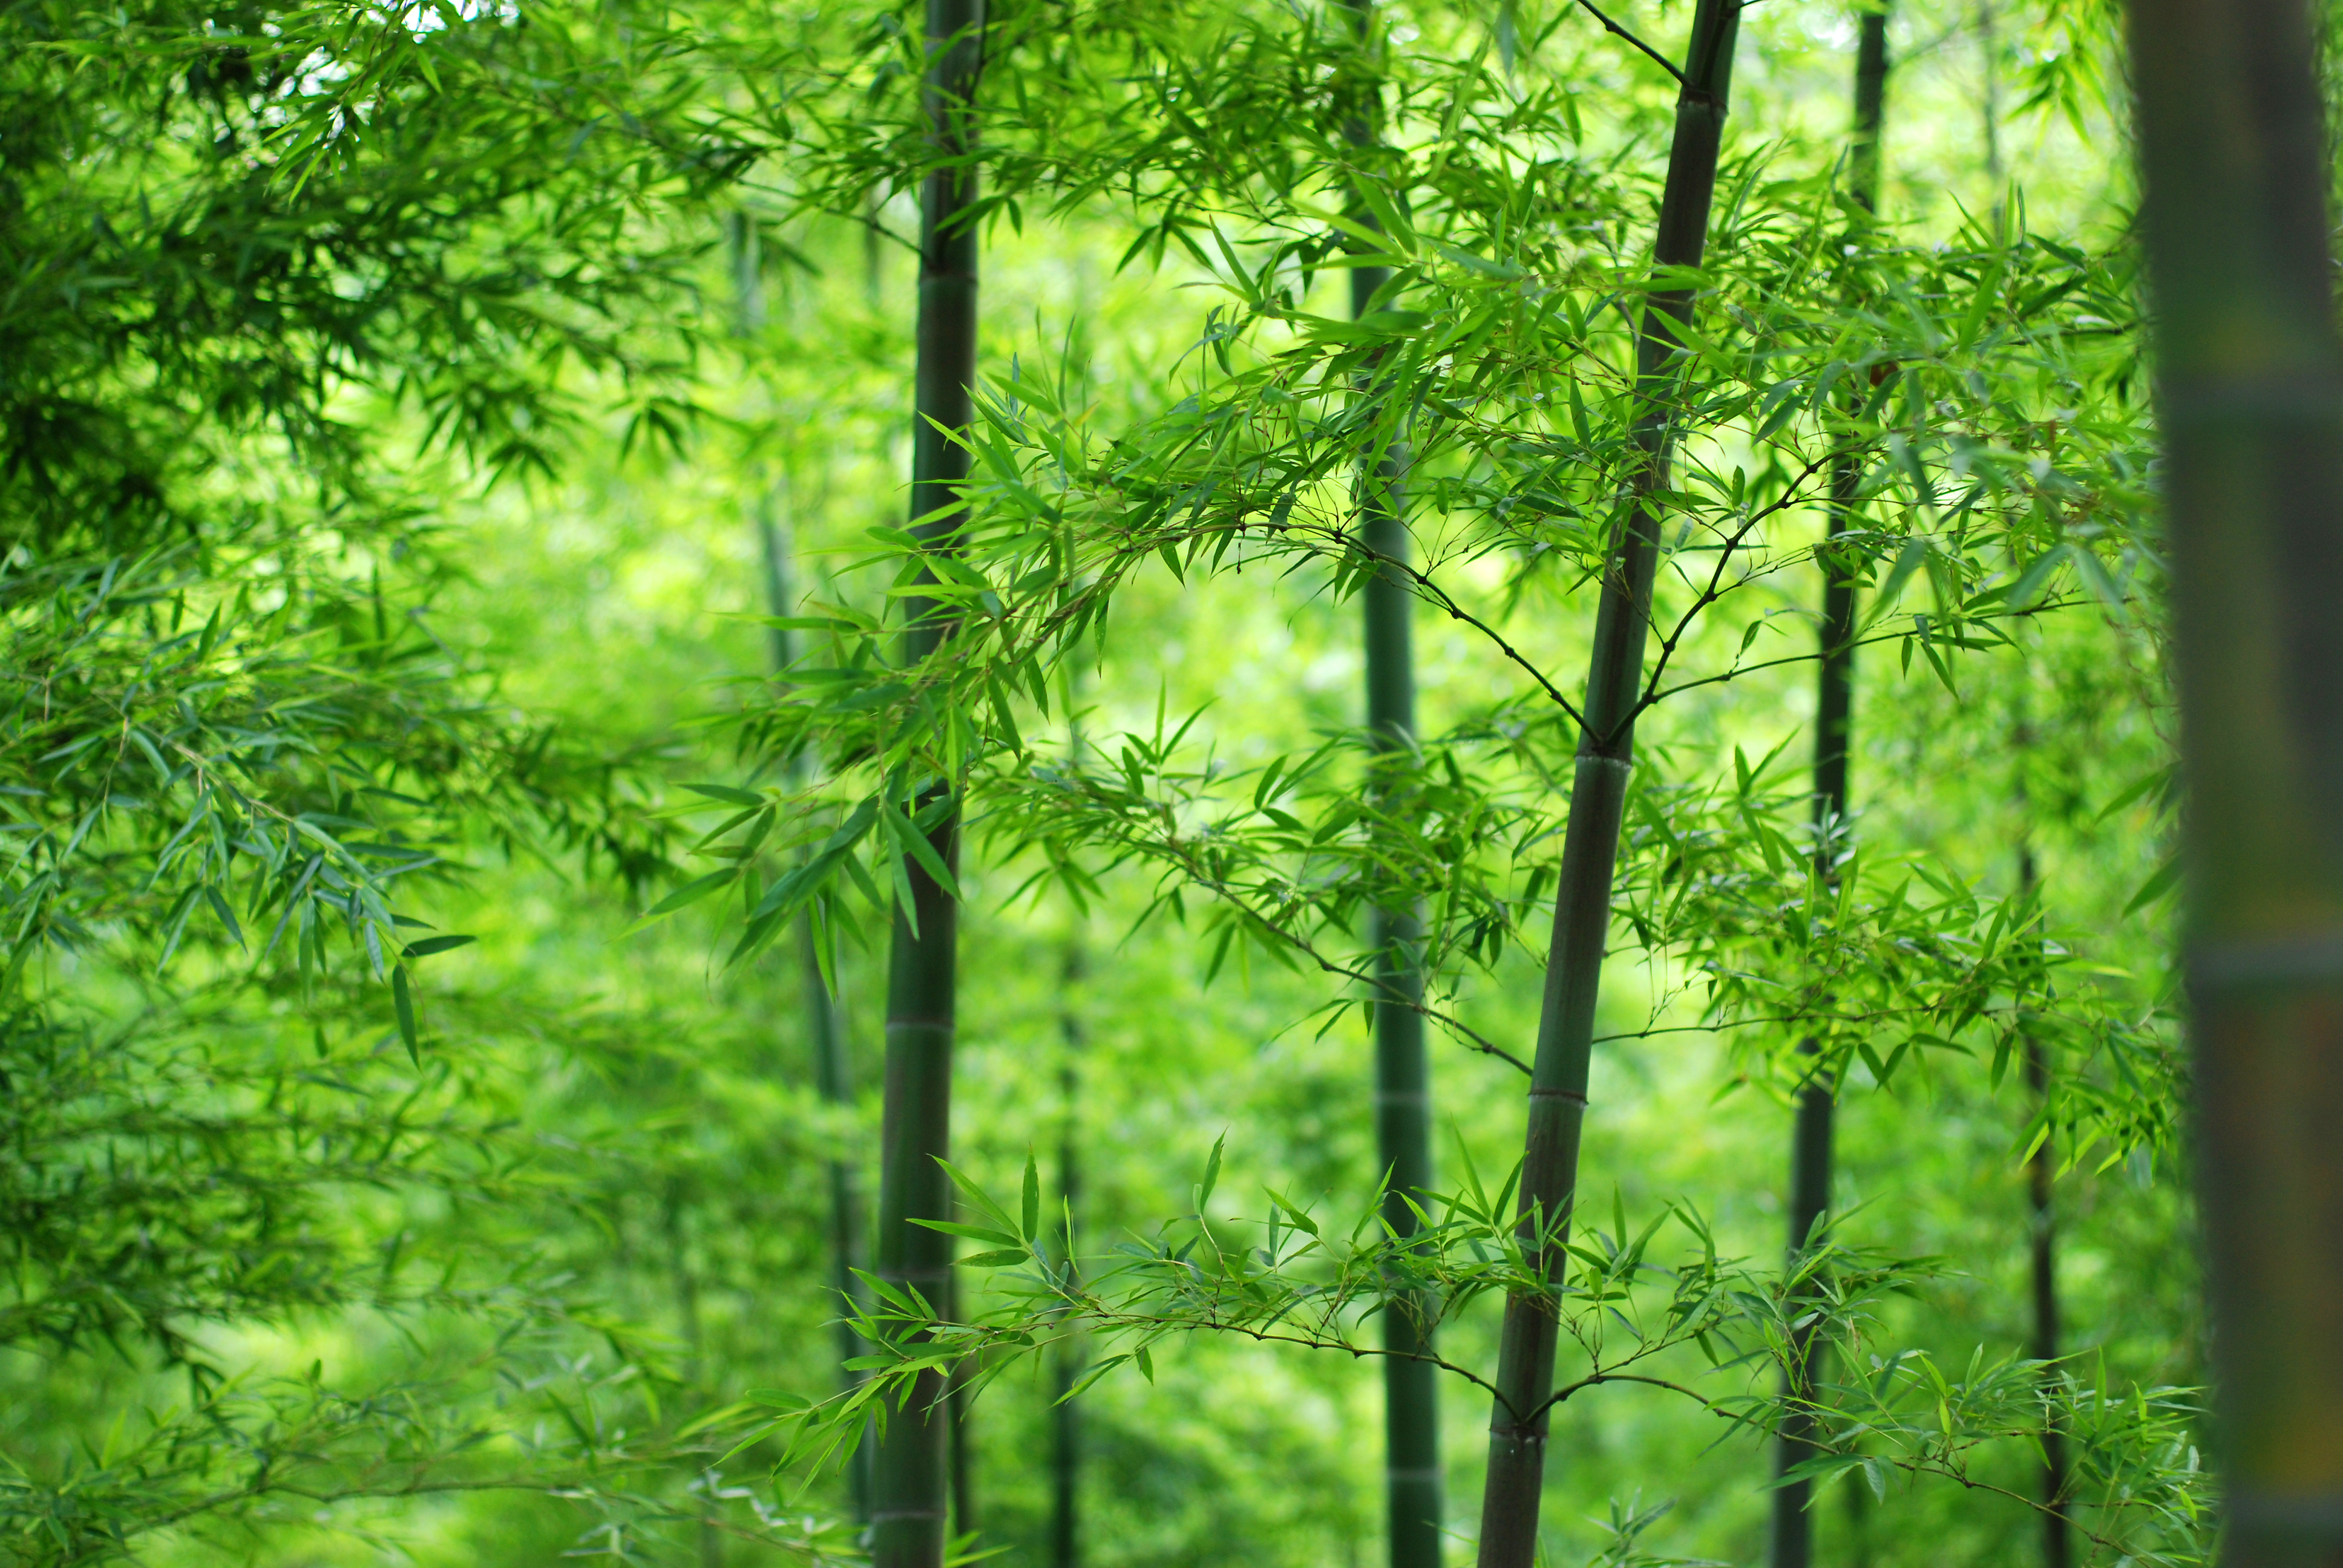 Wood Stem Leaves Bamboo Wallpaper